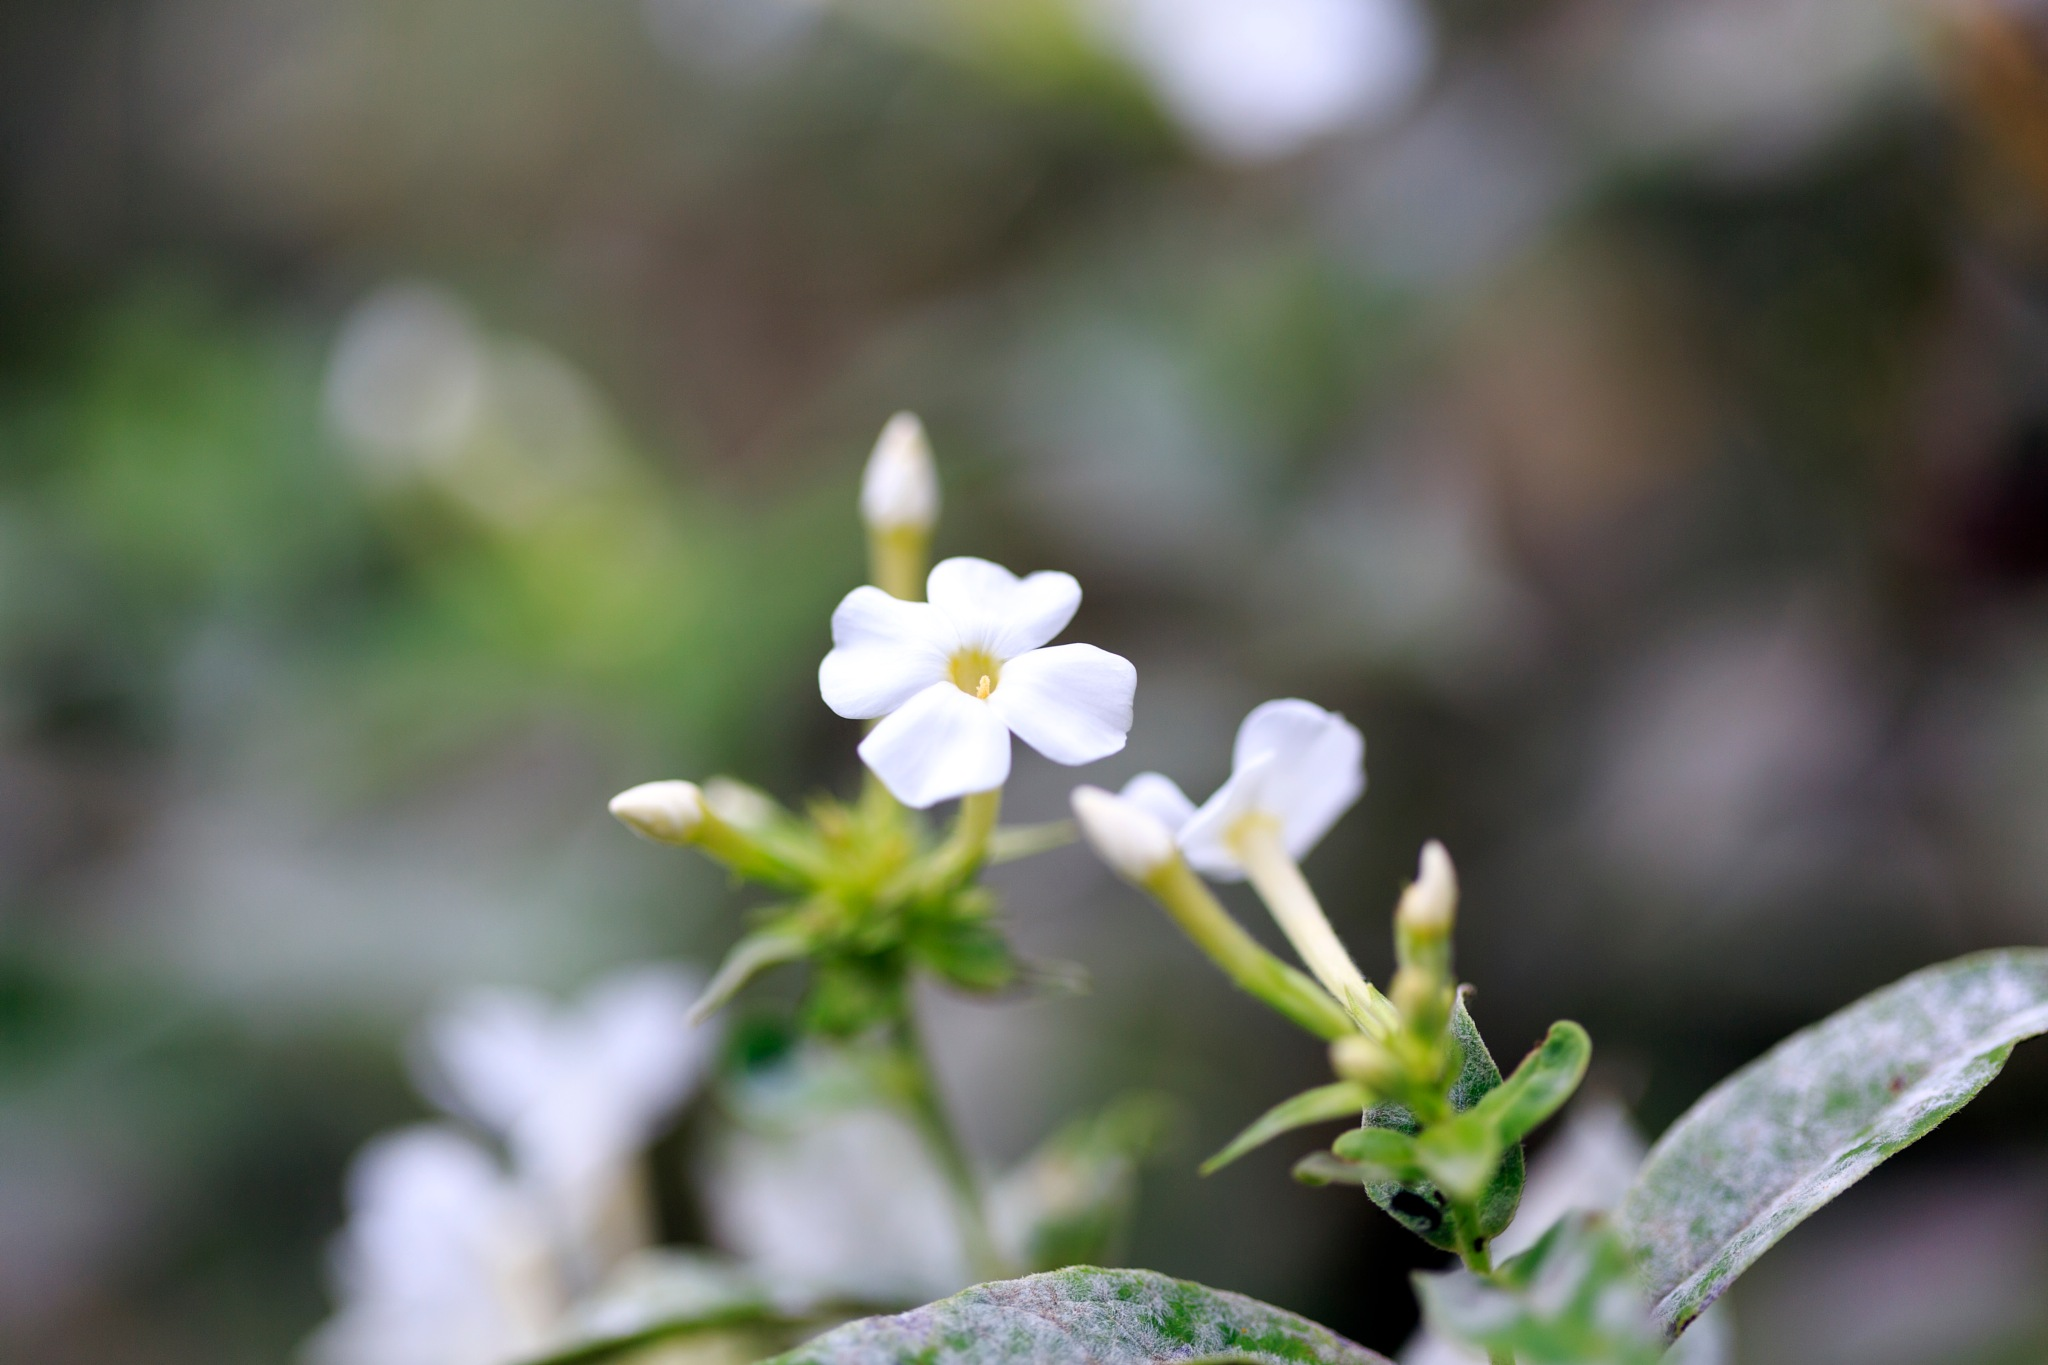 The Flower by Tonetski65